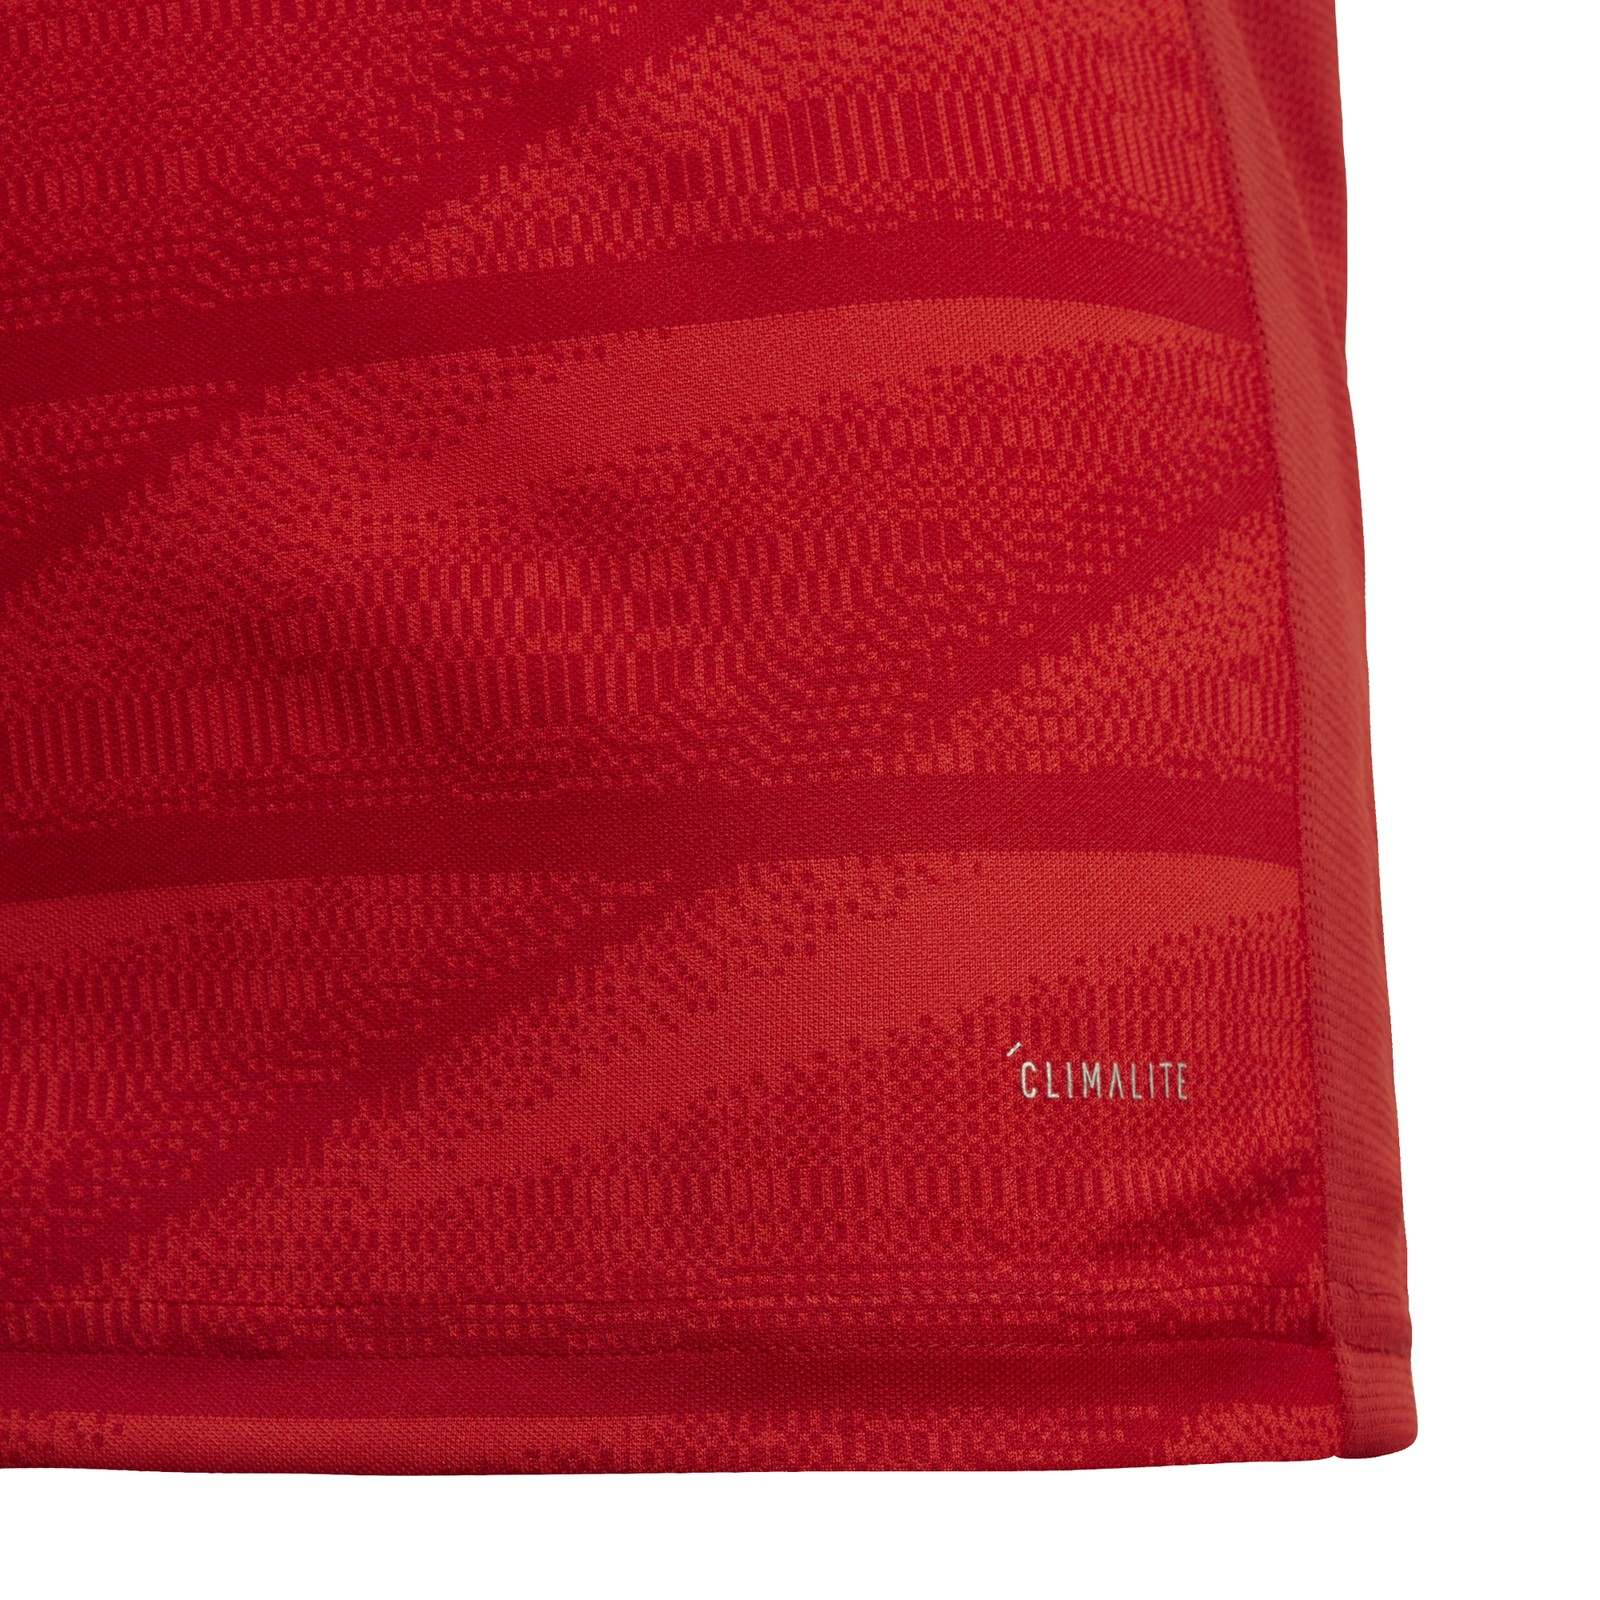 adidas-FC-Bayern-Muenchen-Heimtrikot-Kinder-2019-2020-Home-Jersey-rot-DX9253 Indexbild 23